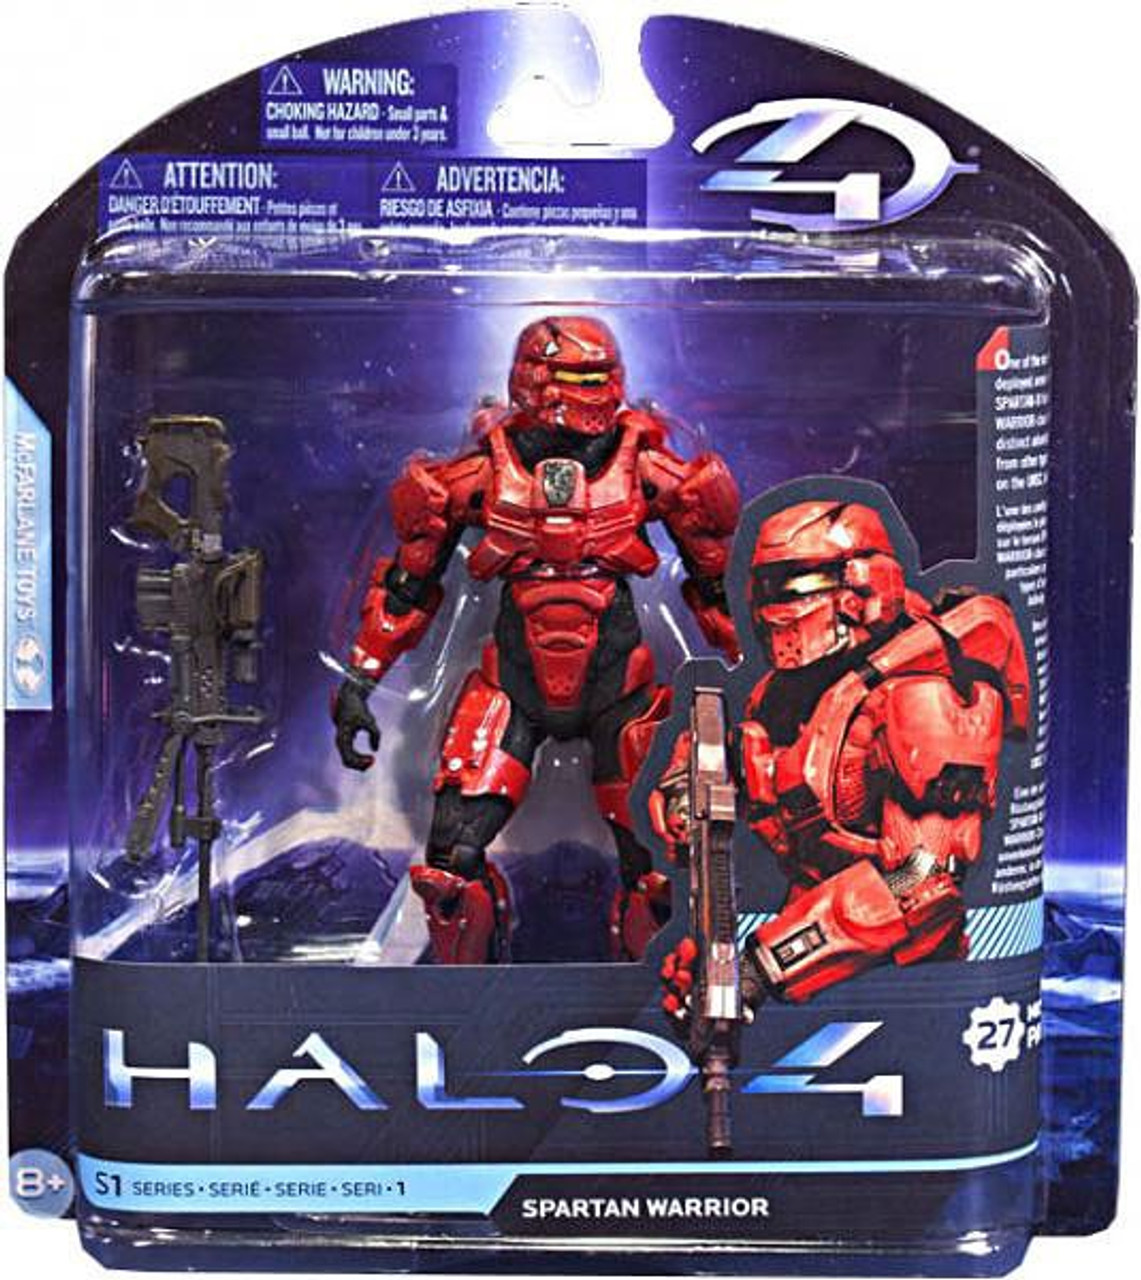 McFarlane Toys Halo 4 Series 1 Spartan Warrior Action Figure [Red]